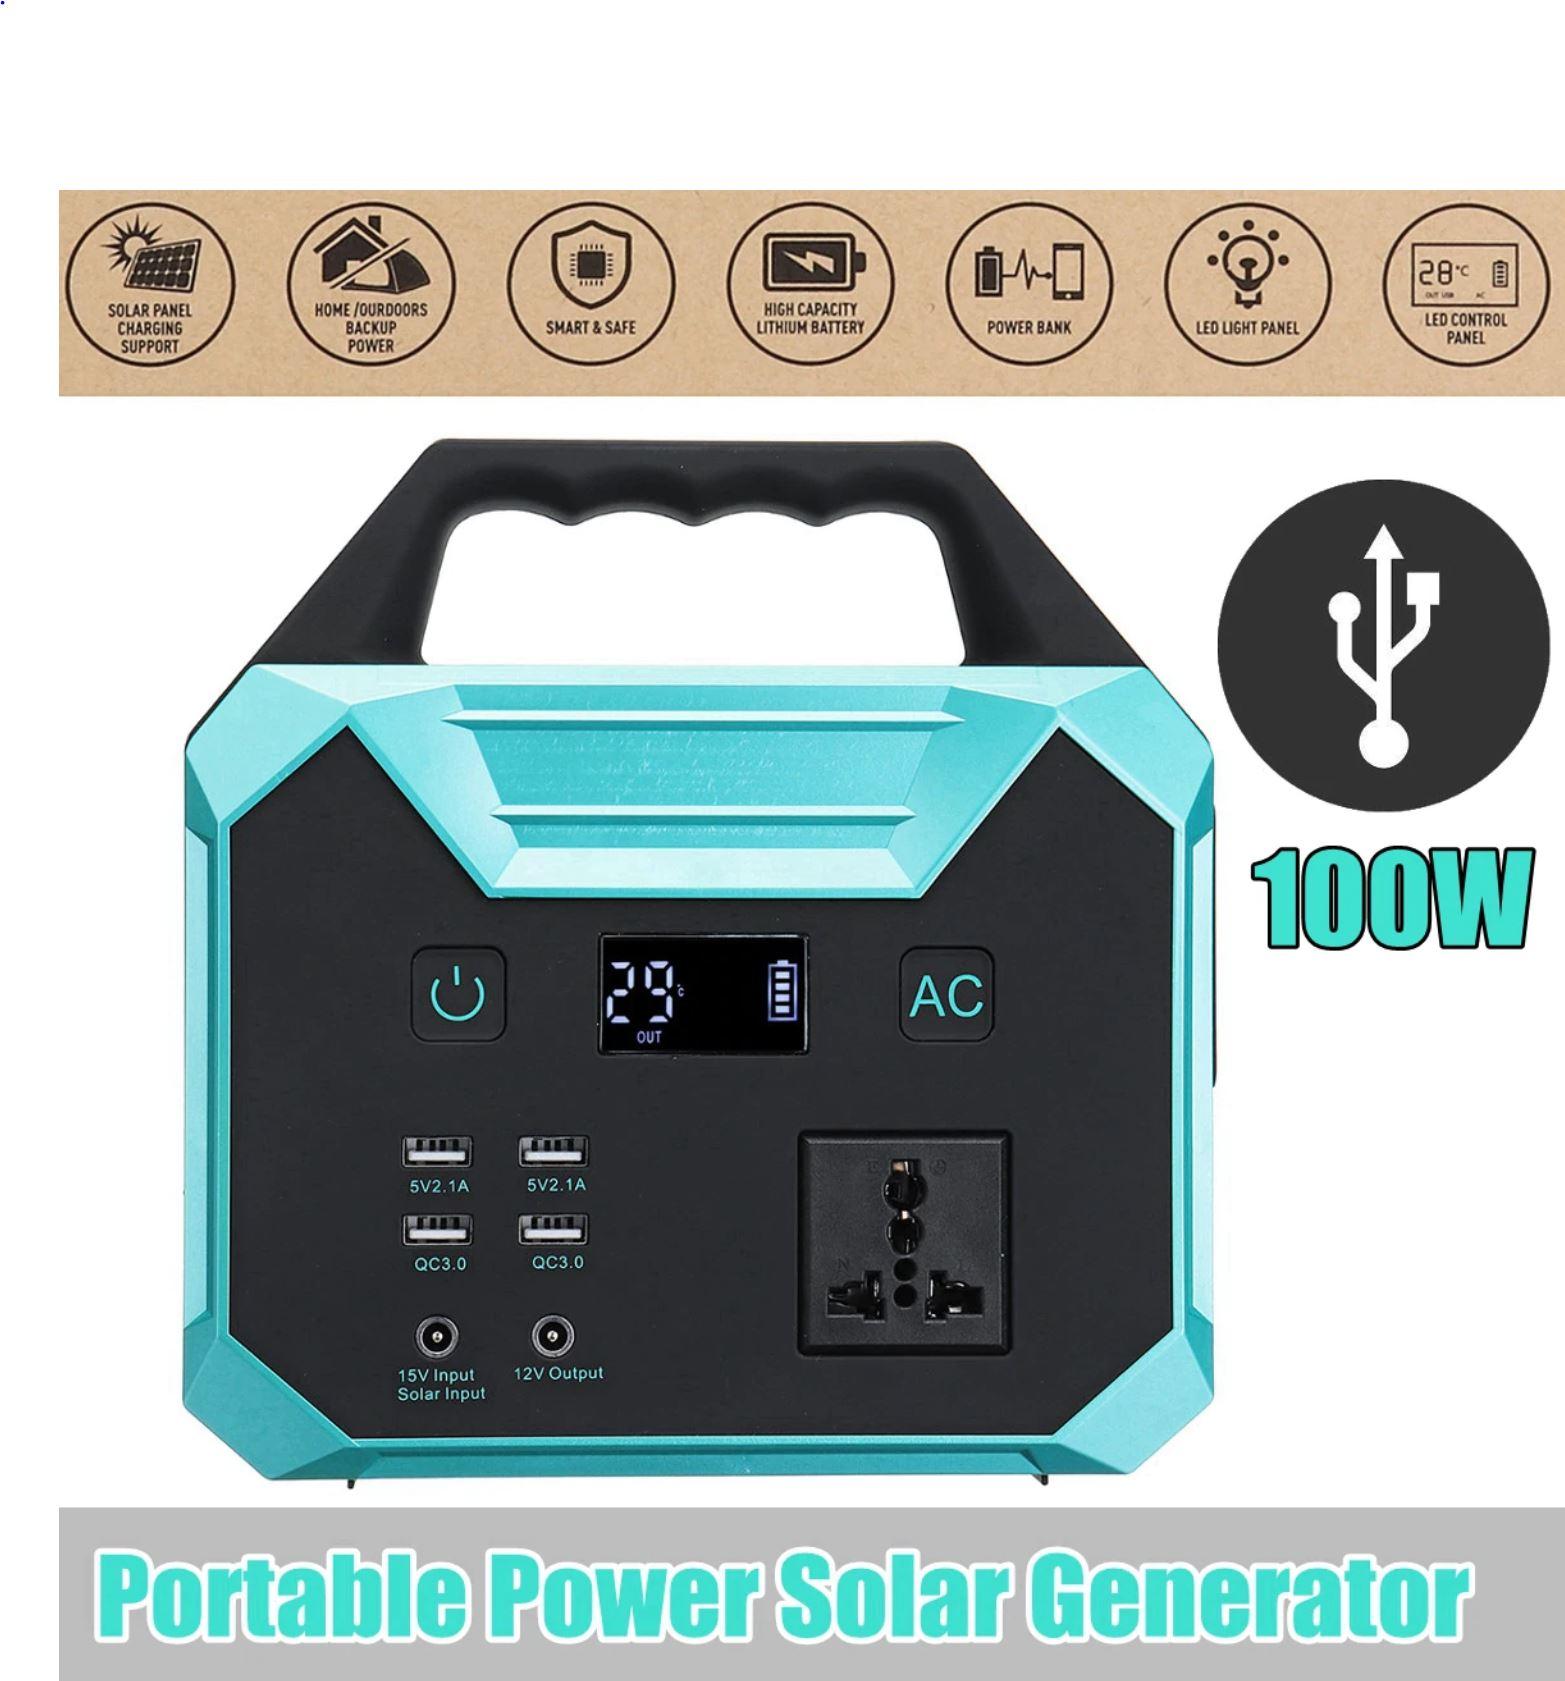 Inverter Portable Solar Generator - Power Supply Energy Power Storage Home  Outdoor Generation EU US 250Wh 100W